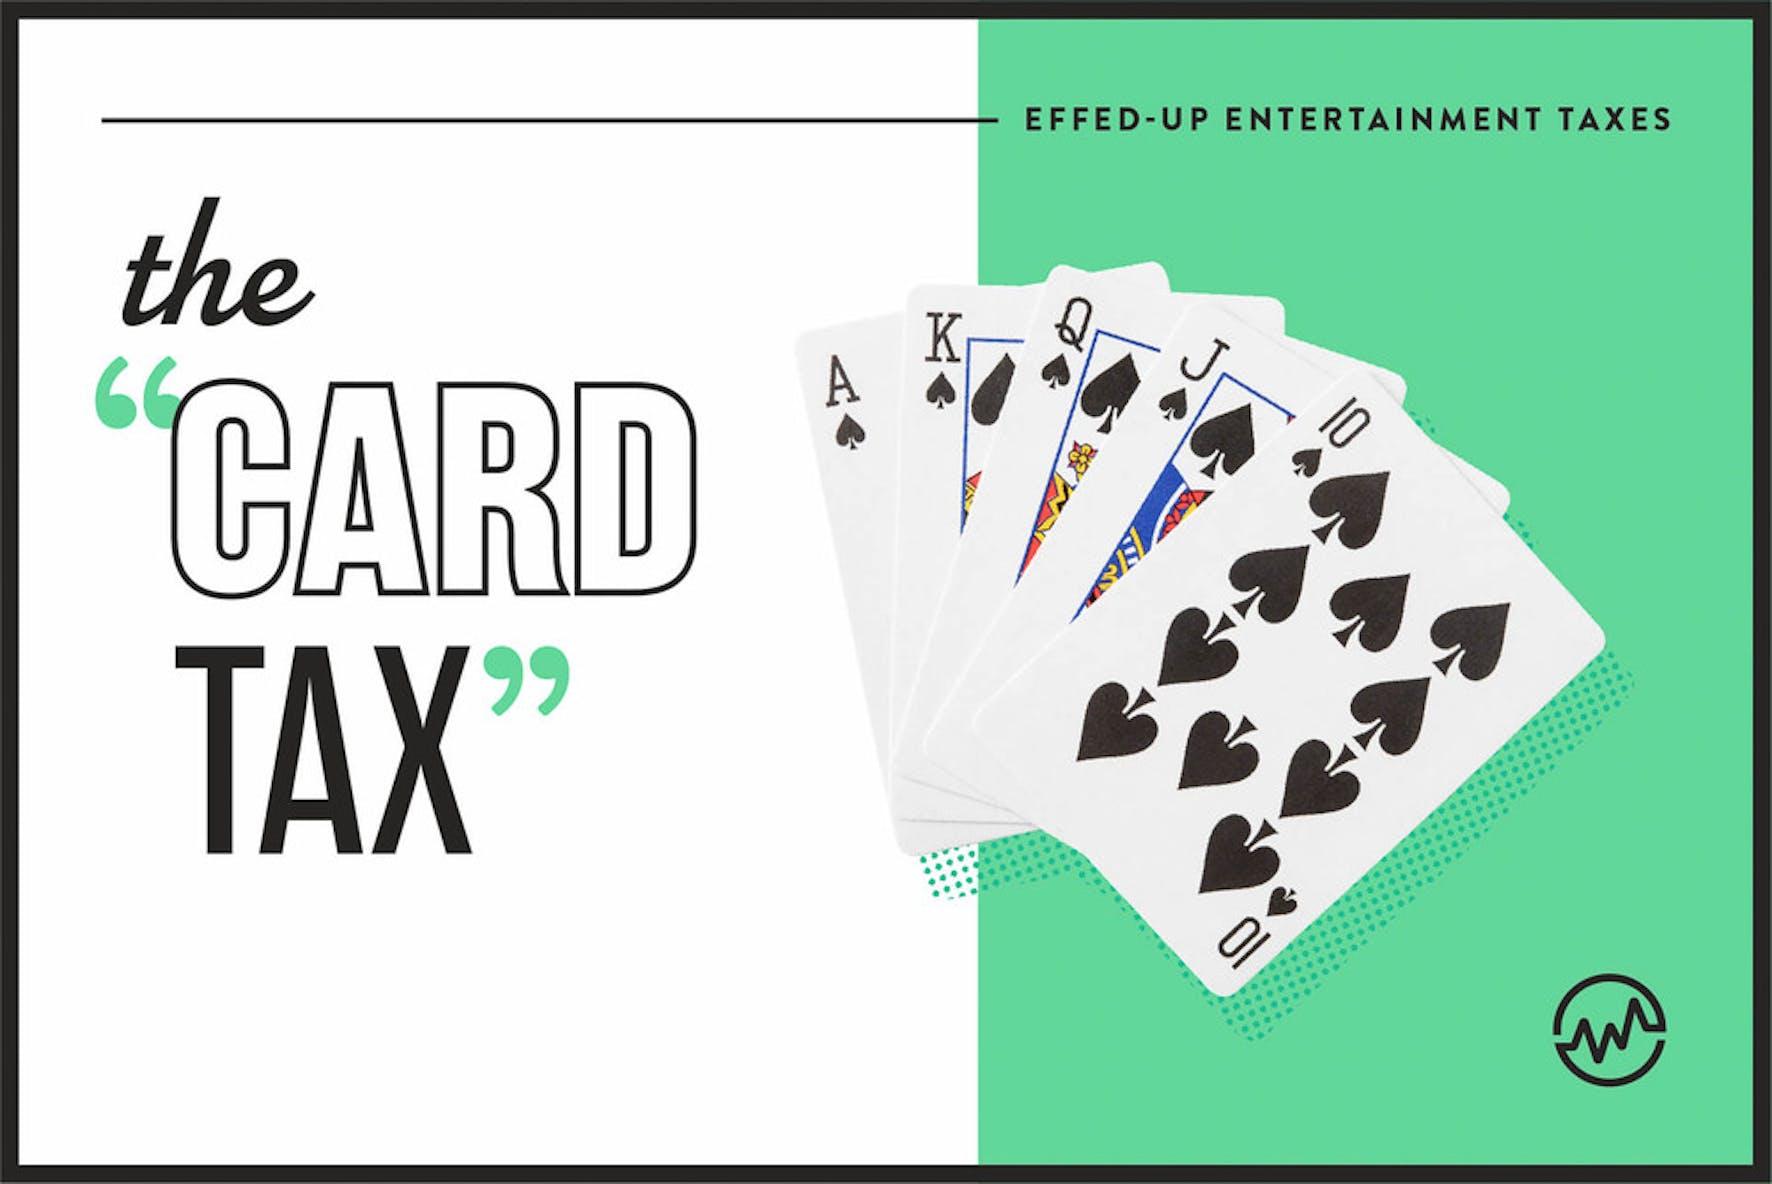 crazy entertainment taxes - the card tax